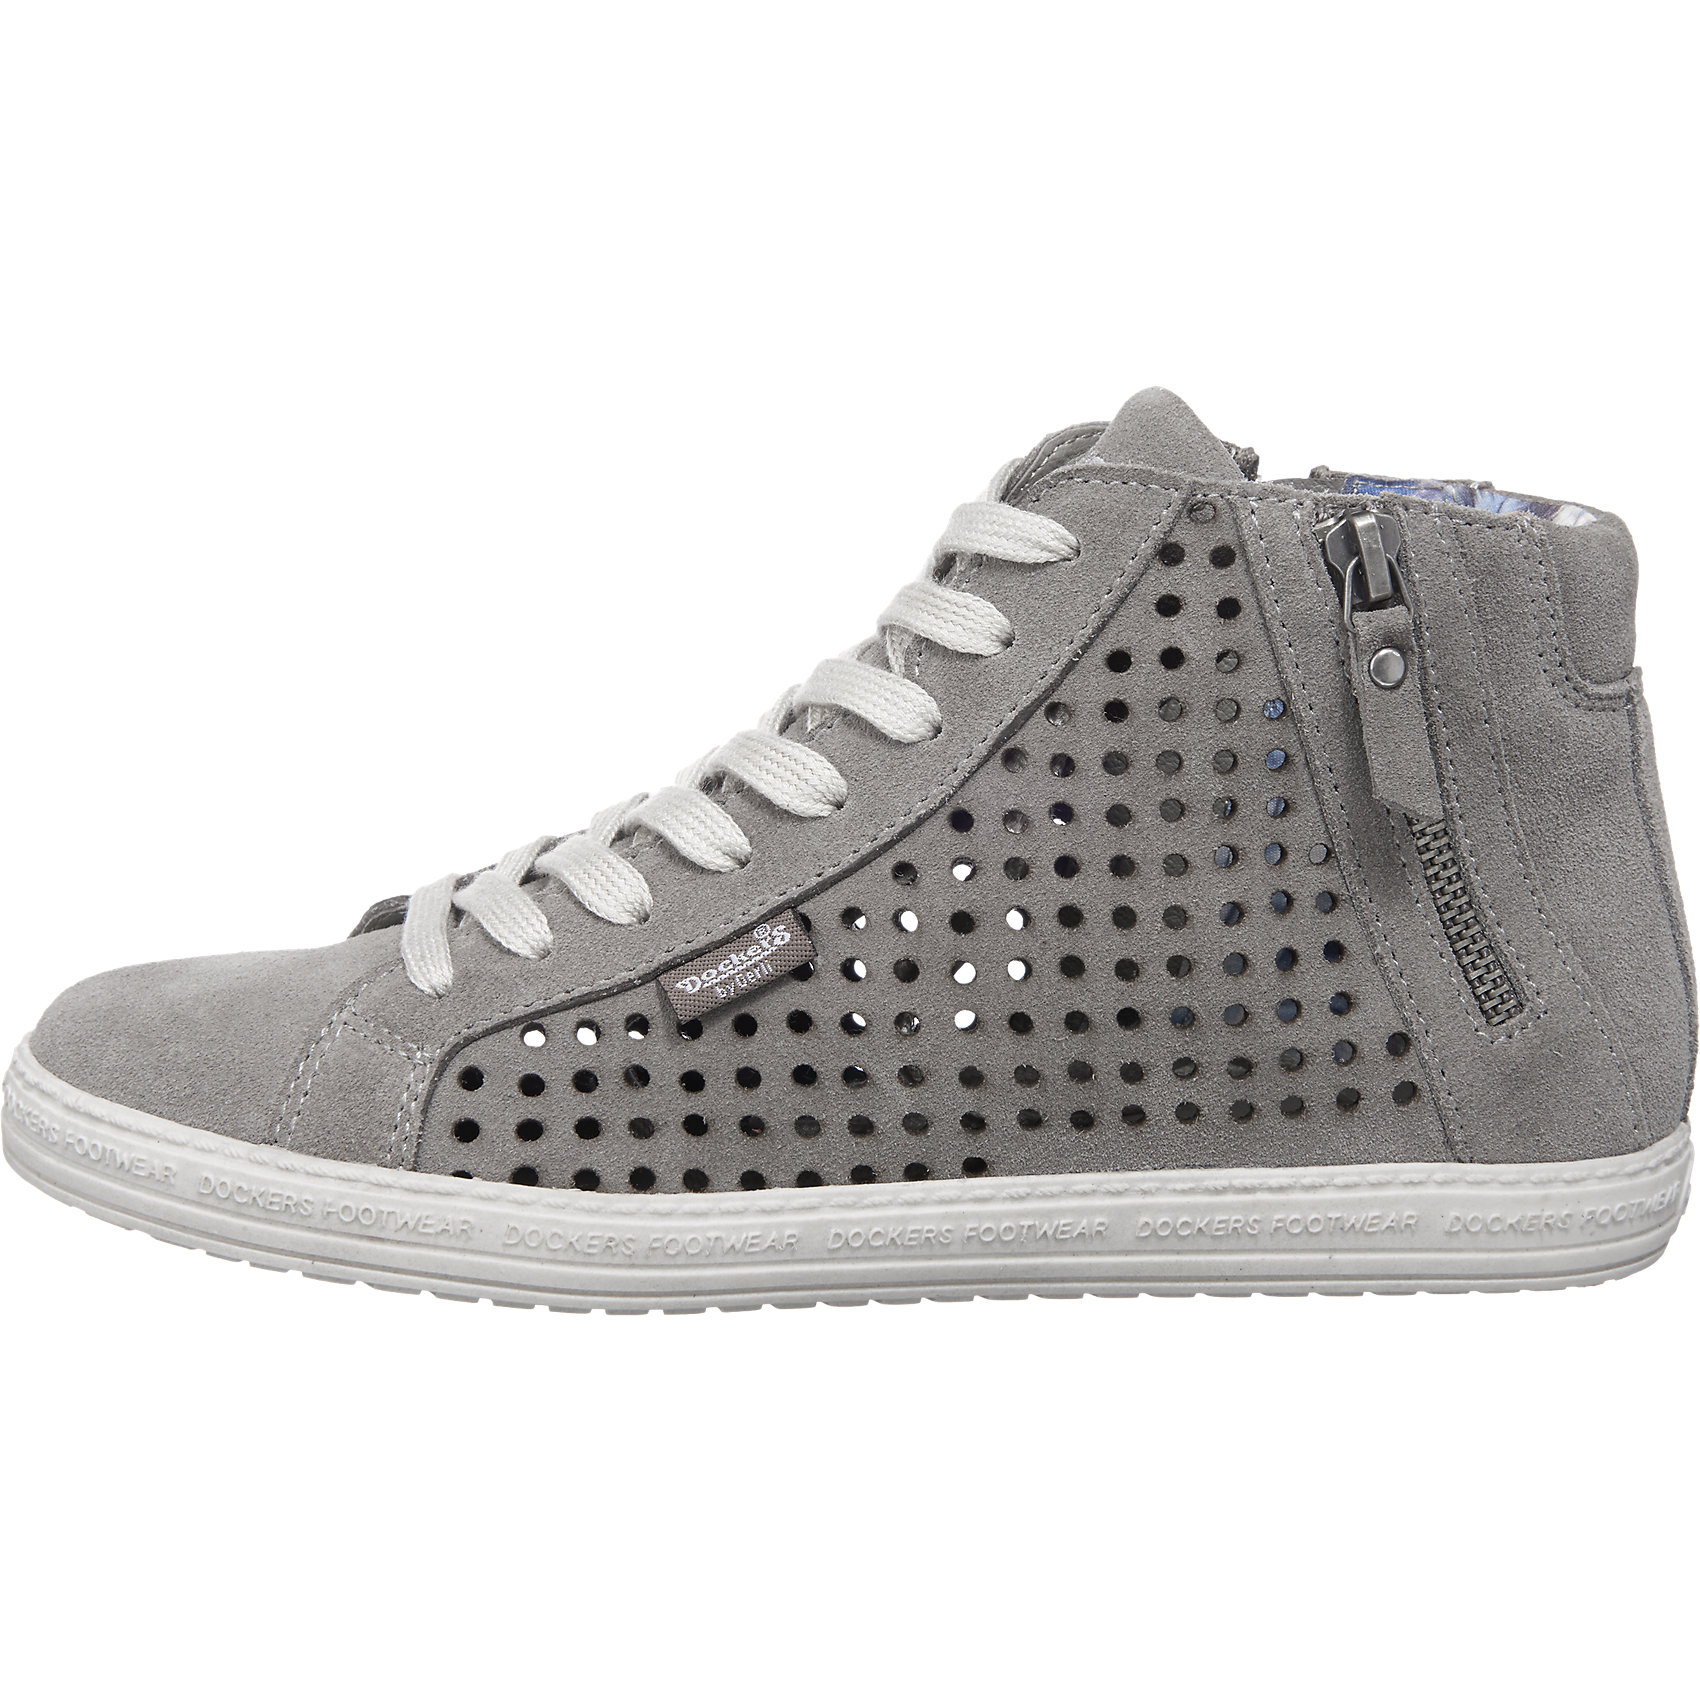 a5b015d642270b Neu-Dockers-by-Gerli-Laureen-Sneakers-grau-5744986 Indexbild